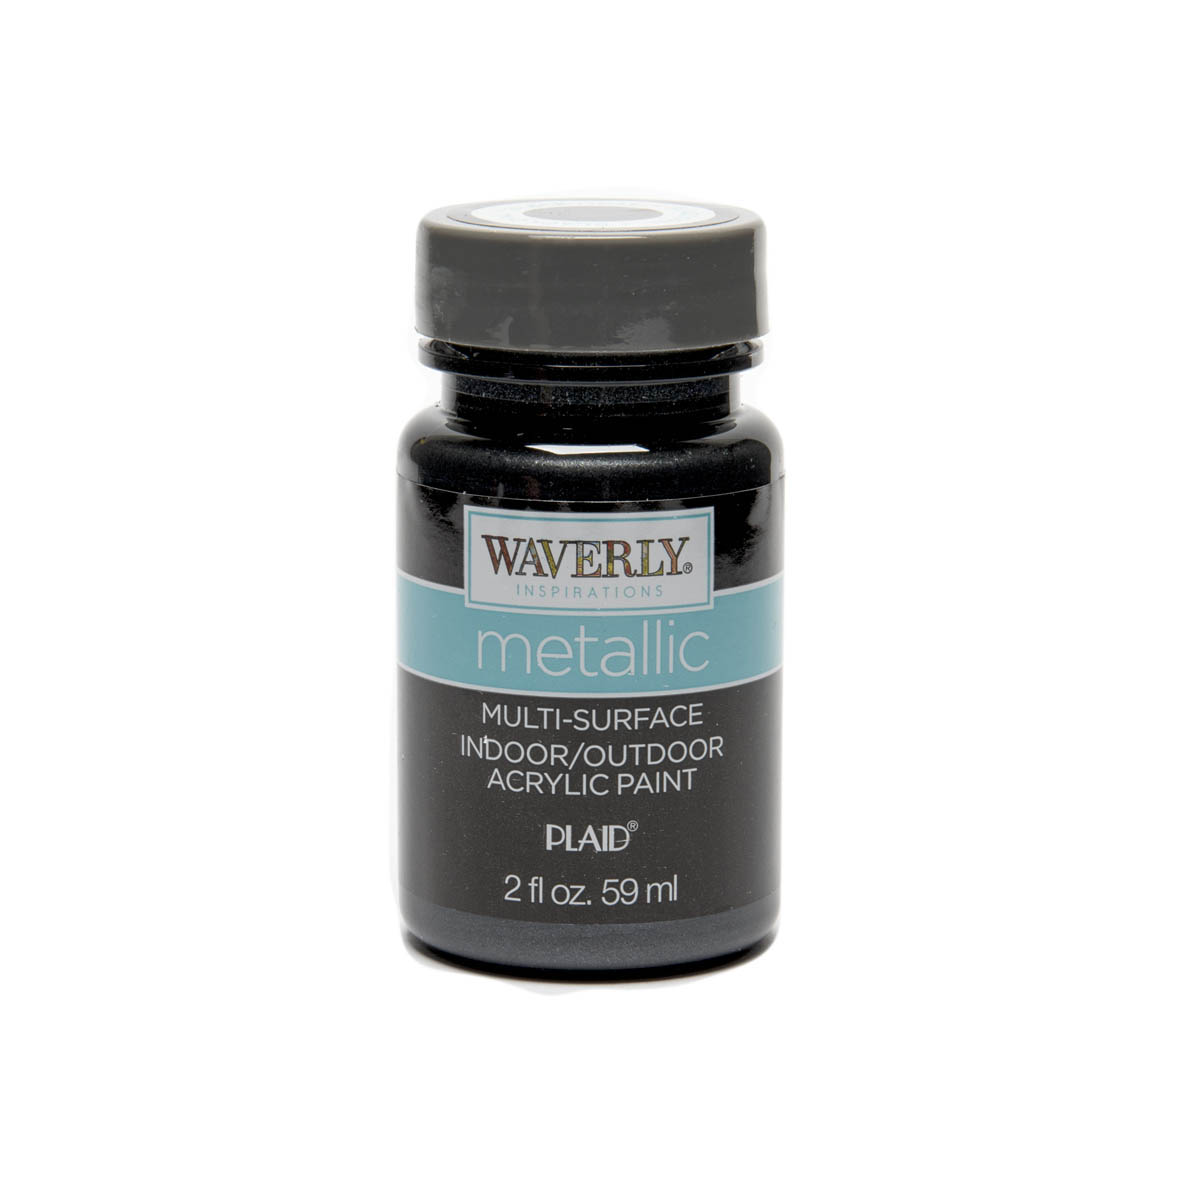 Waverly ® Inspirations Metallic Multi-Surface Acrylic Paint - Black Opal, 2 oz.